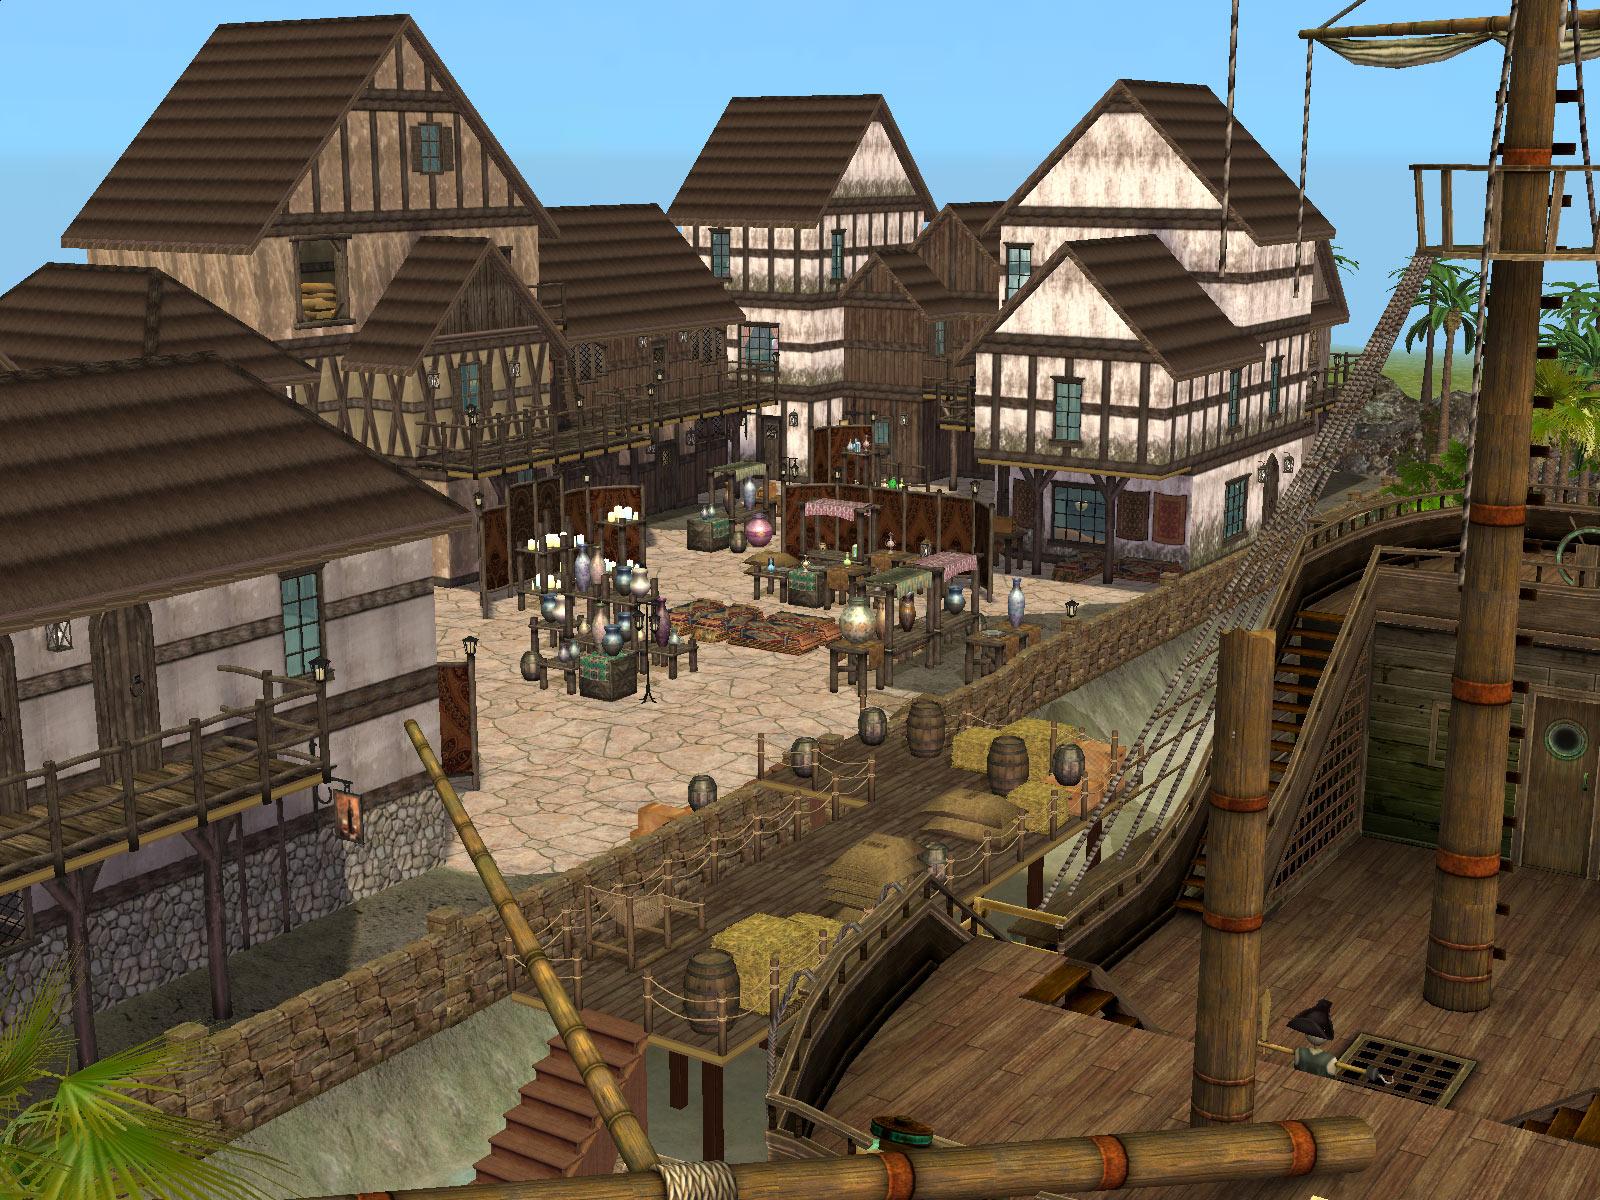 sims 3 university life free download pirates bay